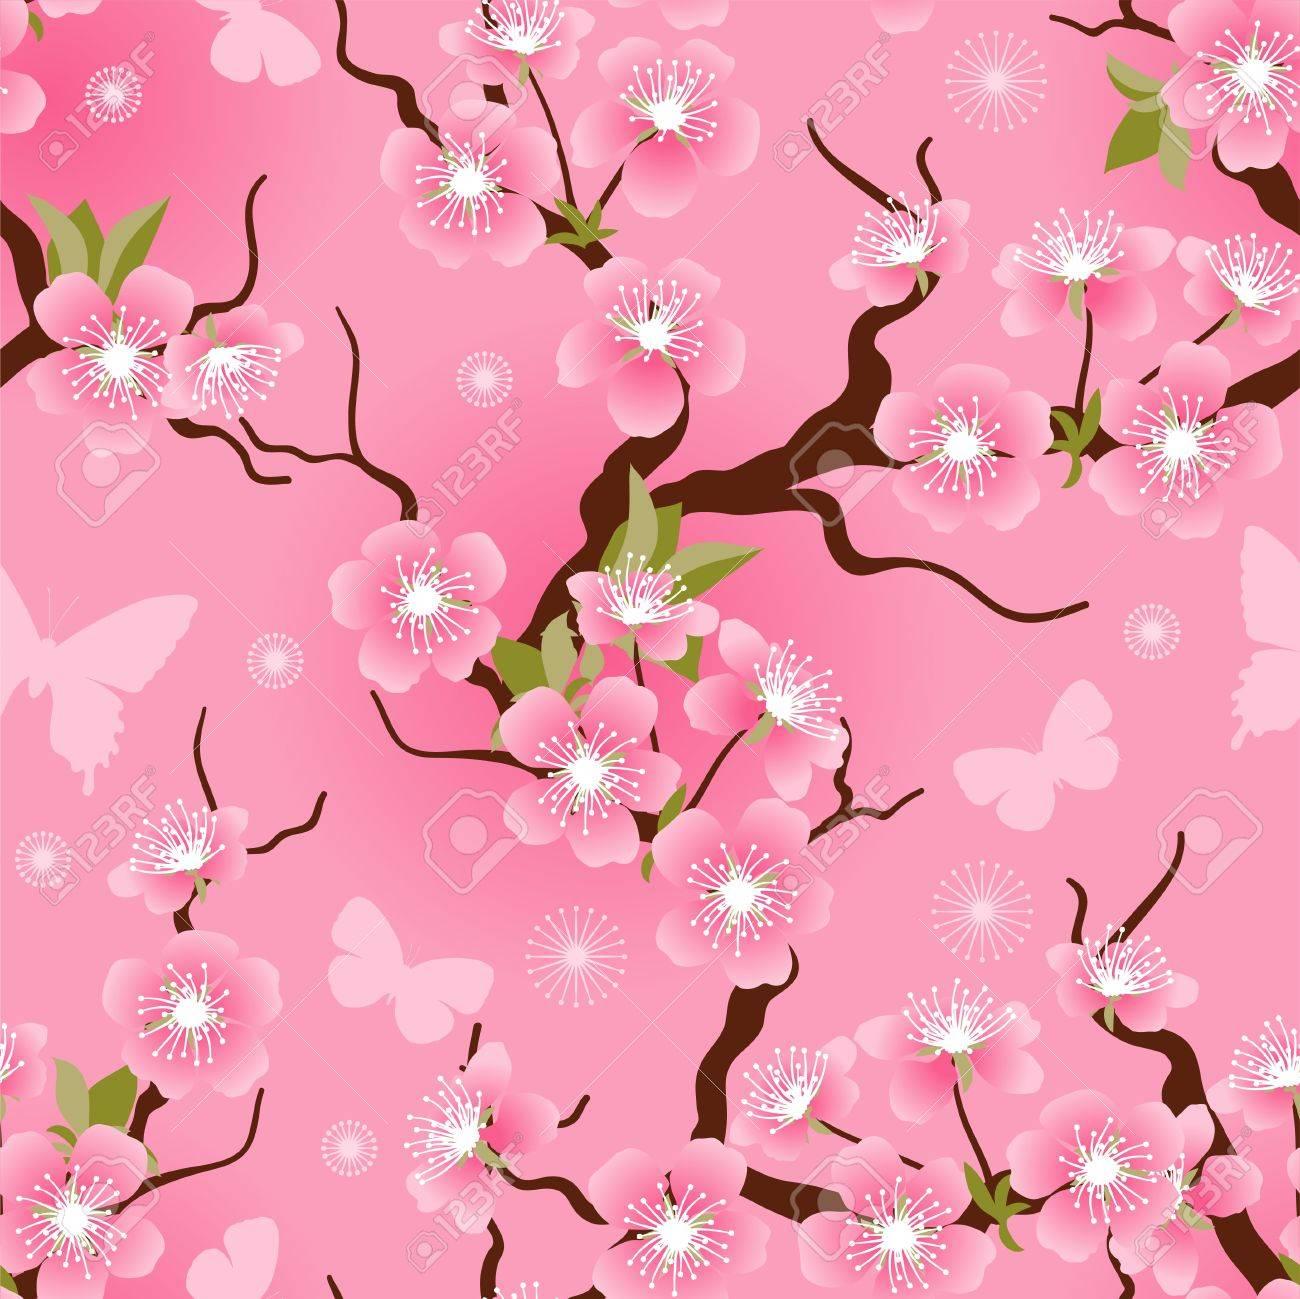 Cherry blossom seamless flowers pattern - 17284054